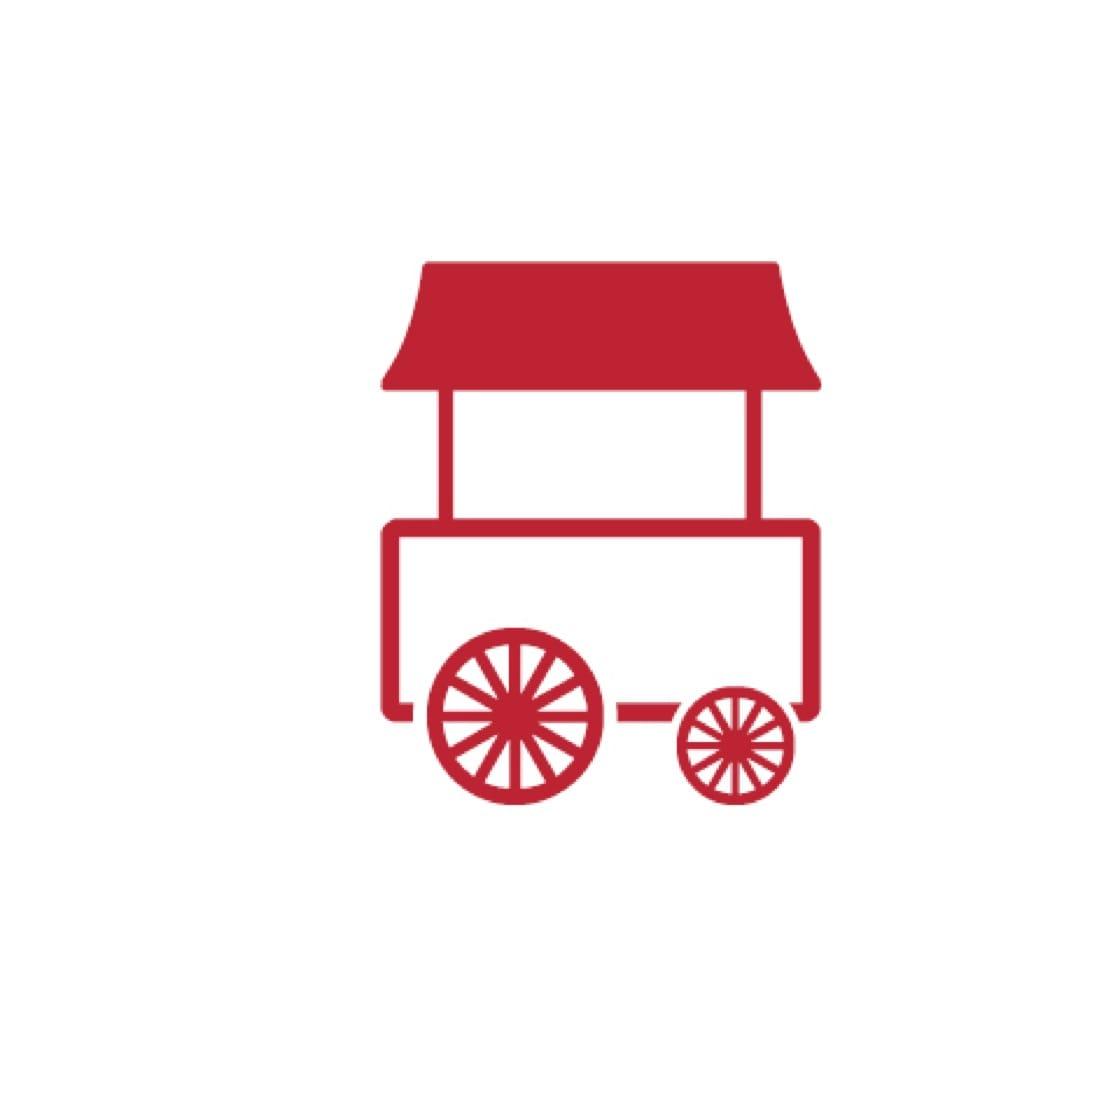 https://d3h1lg3ksw6i6b.cloudfront.net/media/image/2017/06/15/97d98582bc6644b2b1e7b46e44508a56_Street+Food.jpg